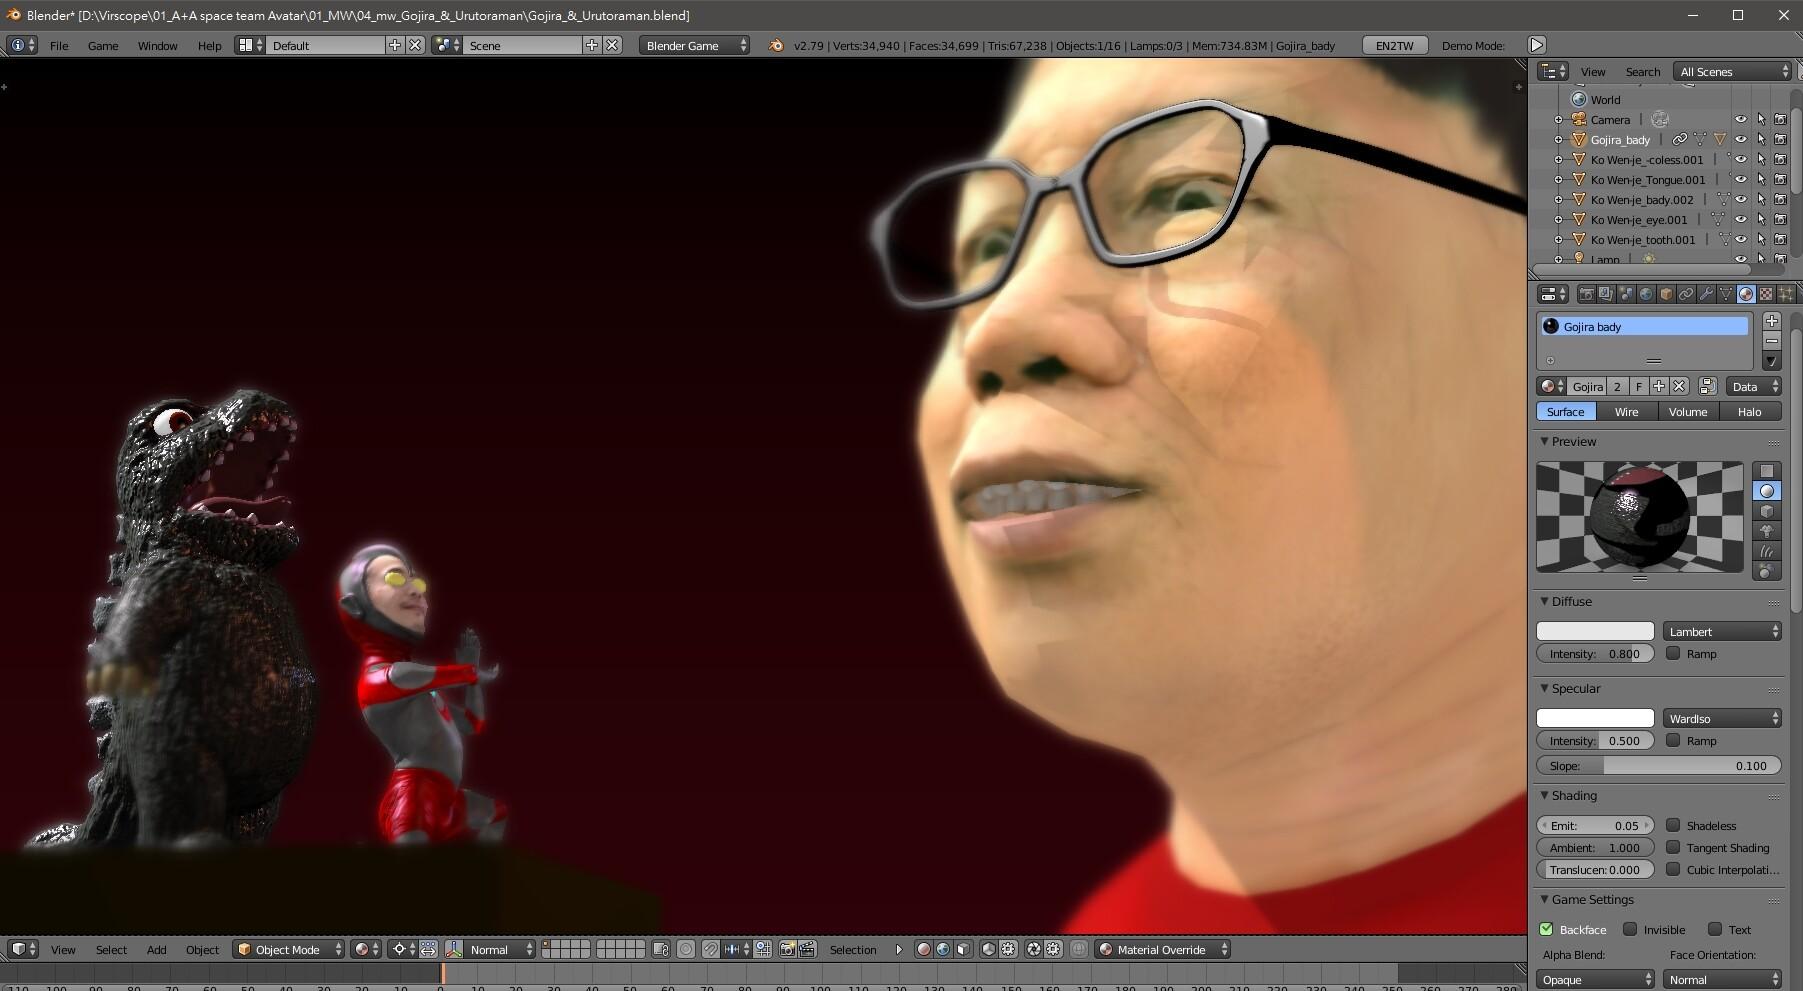 Michael wu blender d virscope 01 a a space team avatar 01 mw 04 mw gojira urutoraman g20180802 007034